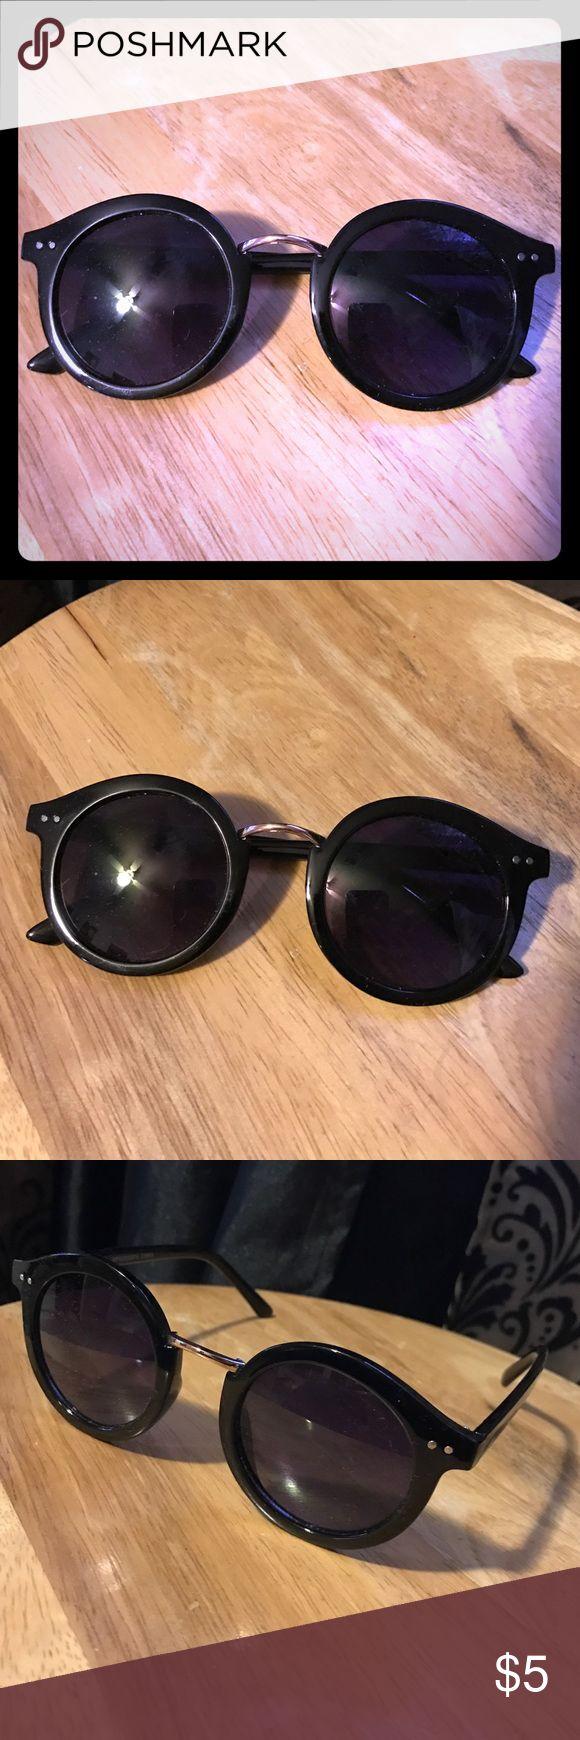 Ladies Sunglasses Cute adorable black round frame. Dark tinted. Excellent condition. WINDSOR Accessories Sunglasses